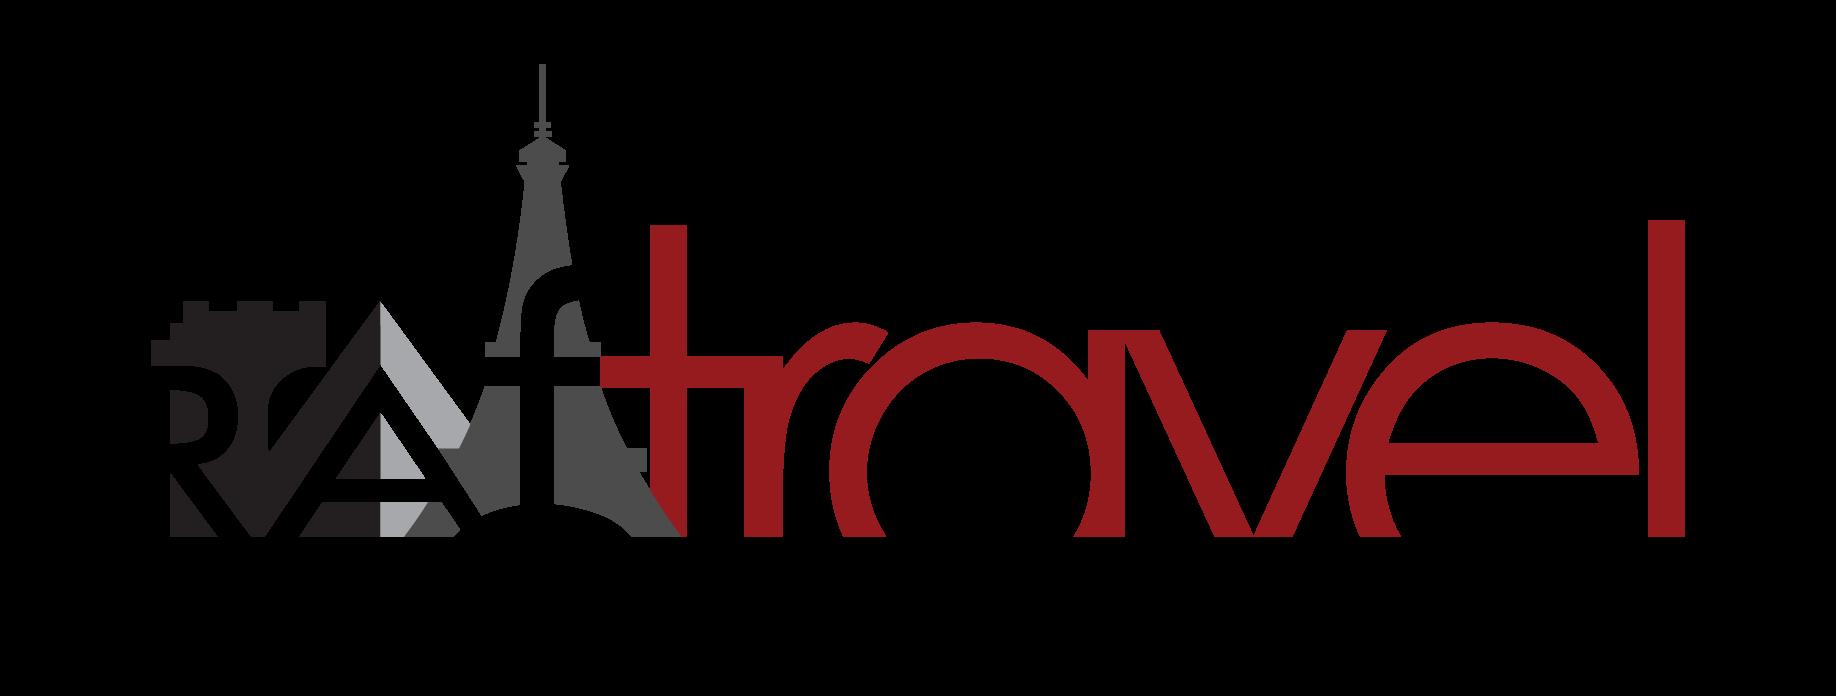 Raftravel-logotipo